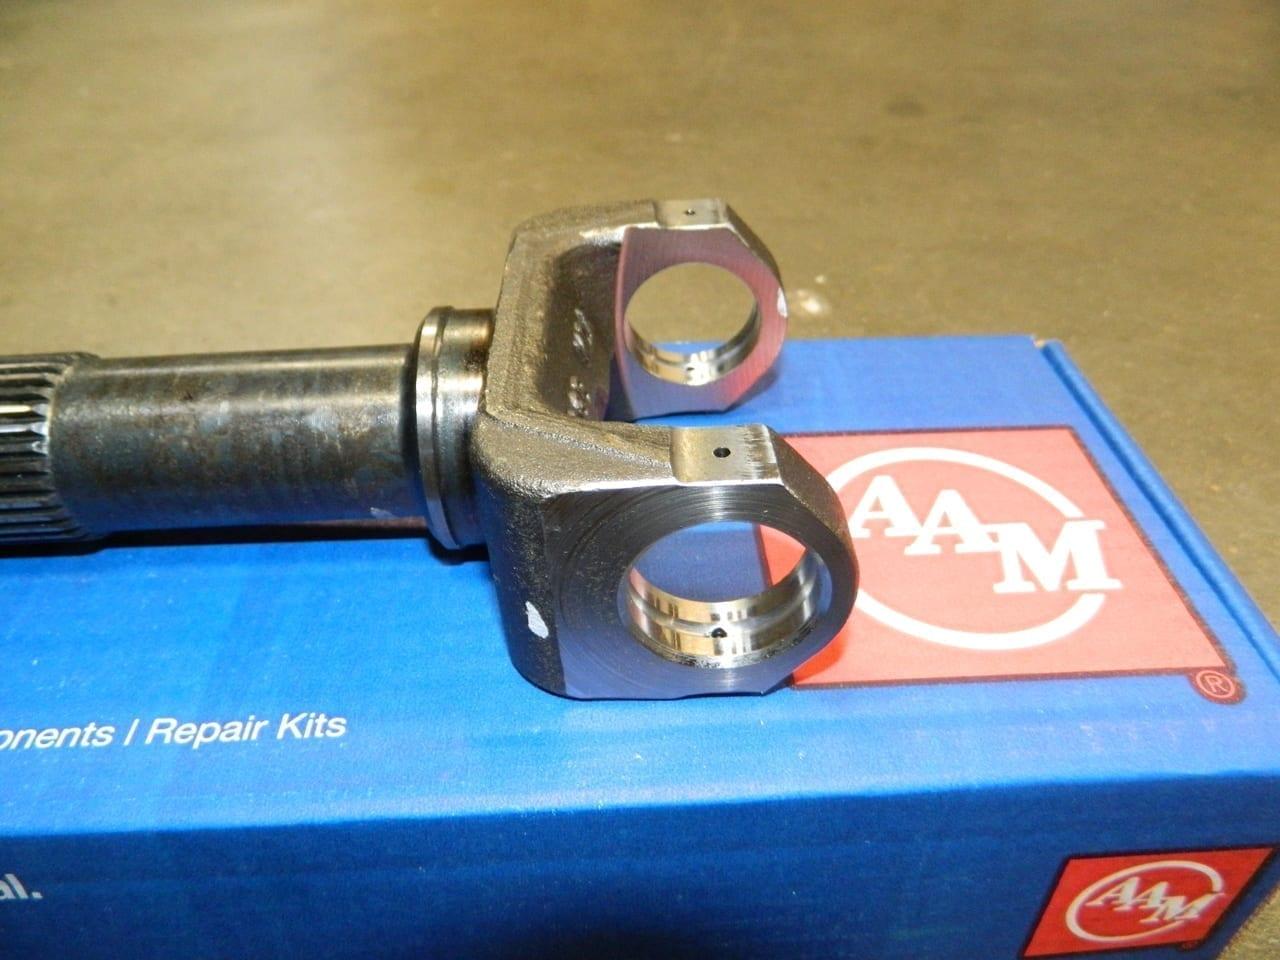 Chevy GM 4X4 Front Driveshaft Slip Yoke Shaft 246 263 3R 1344 Transfer Case Male